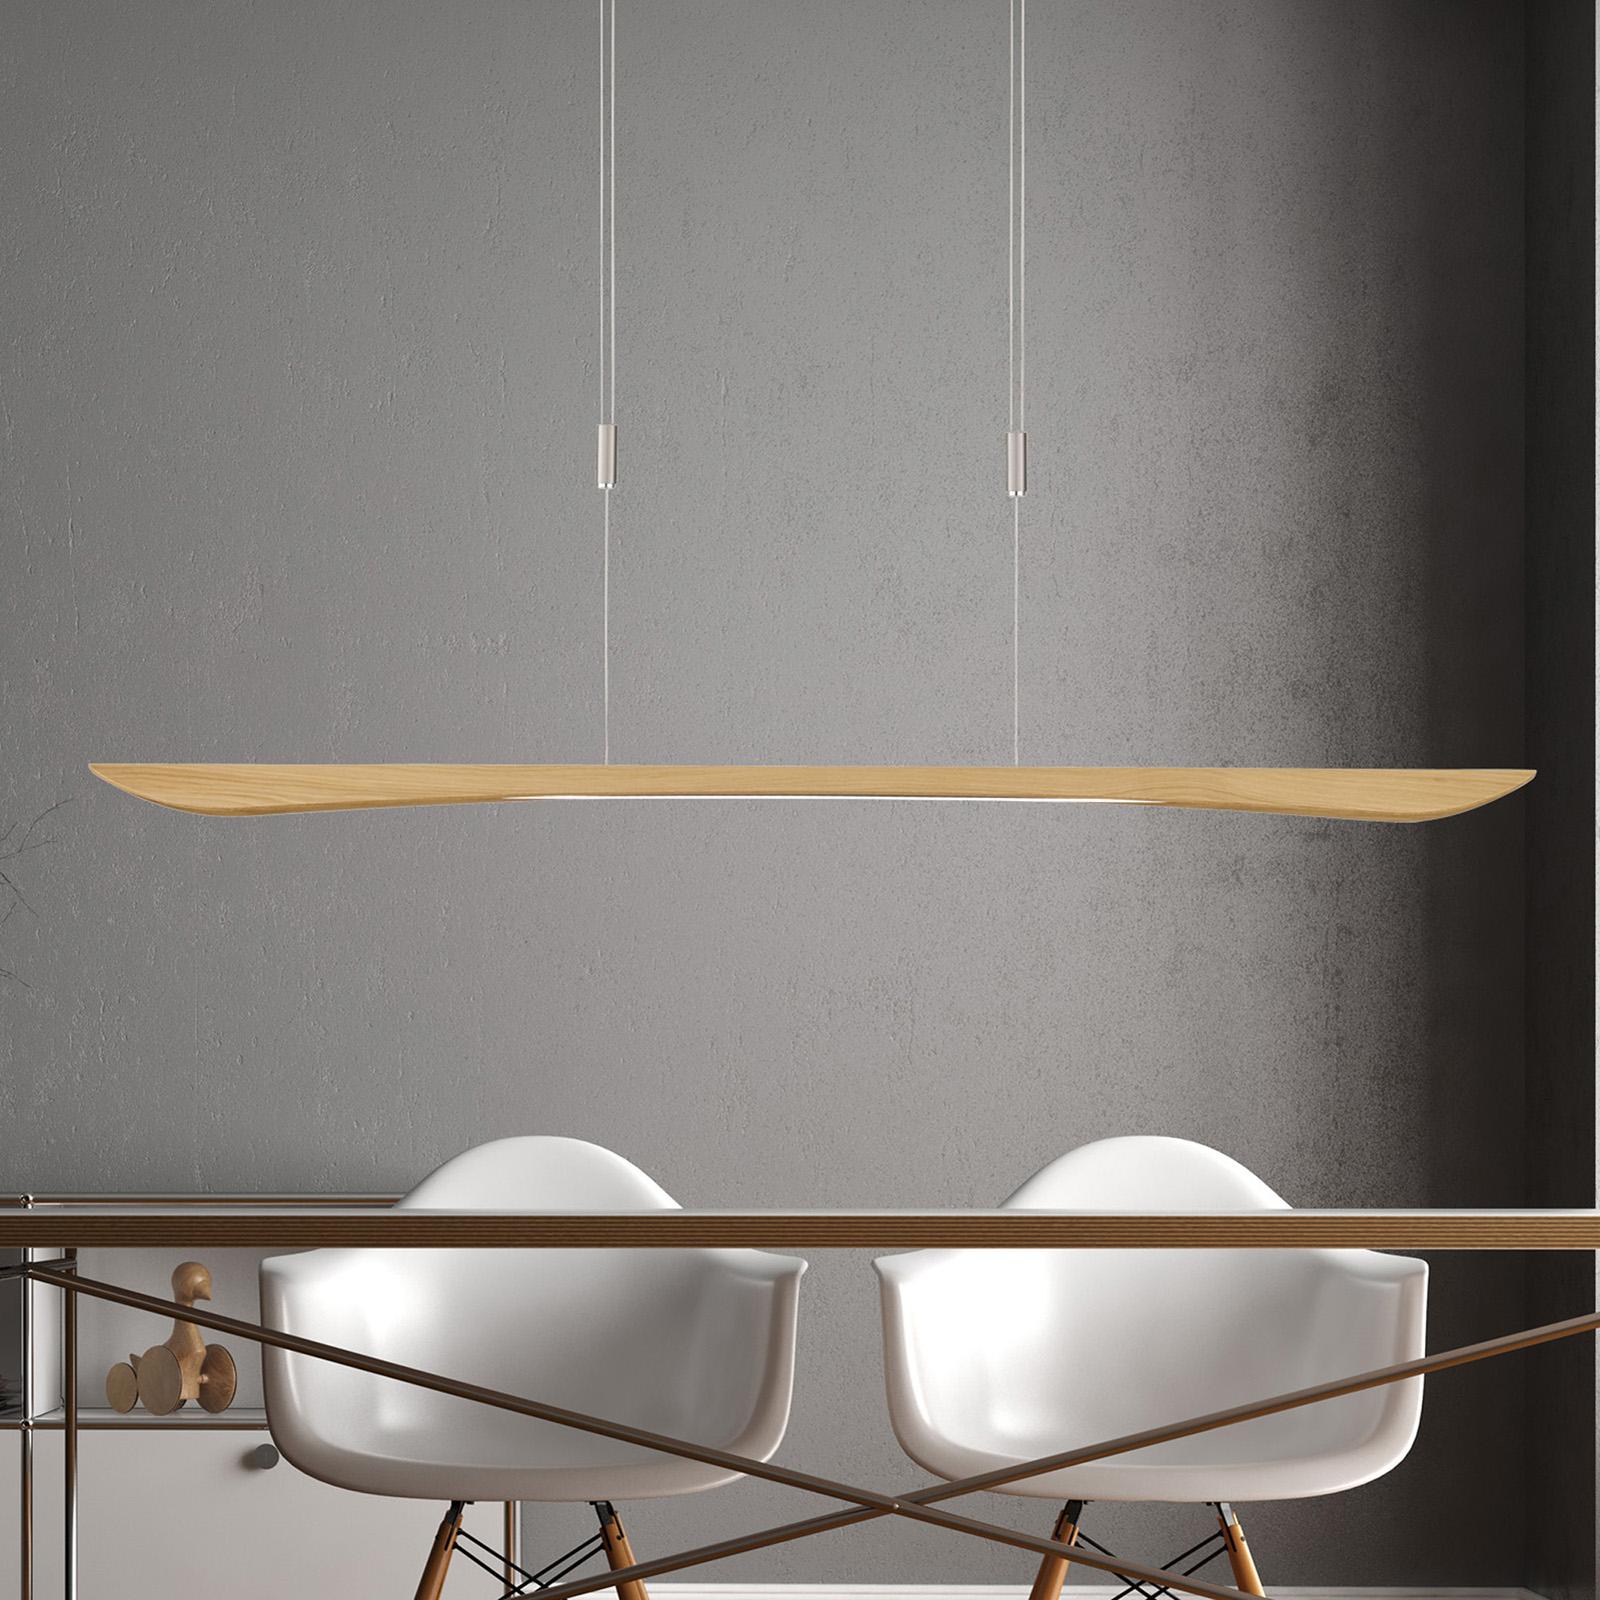 Lucande Hiba LED-pendellampe, natur eg, 148 cm